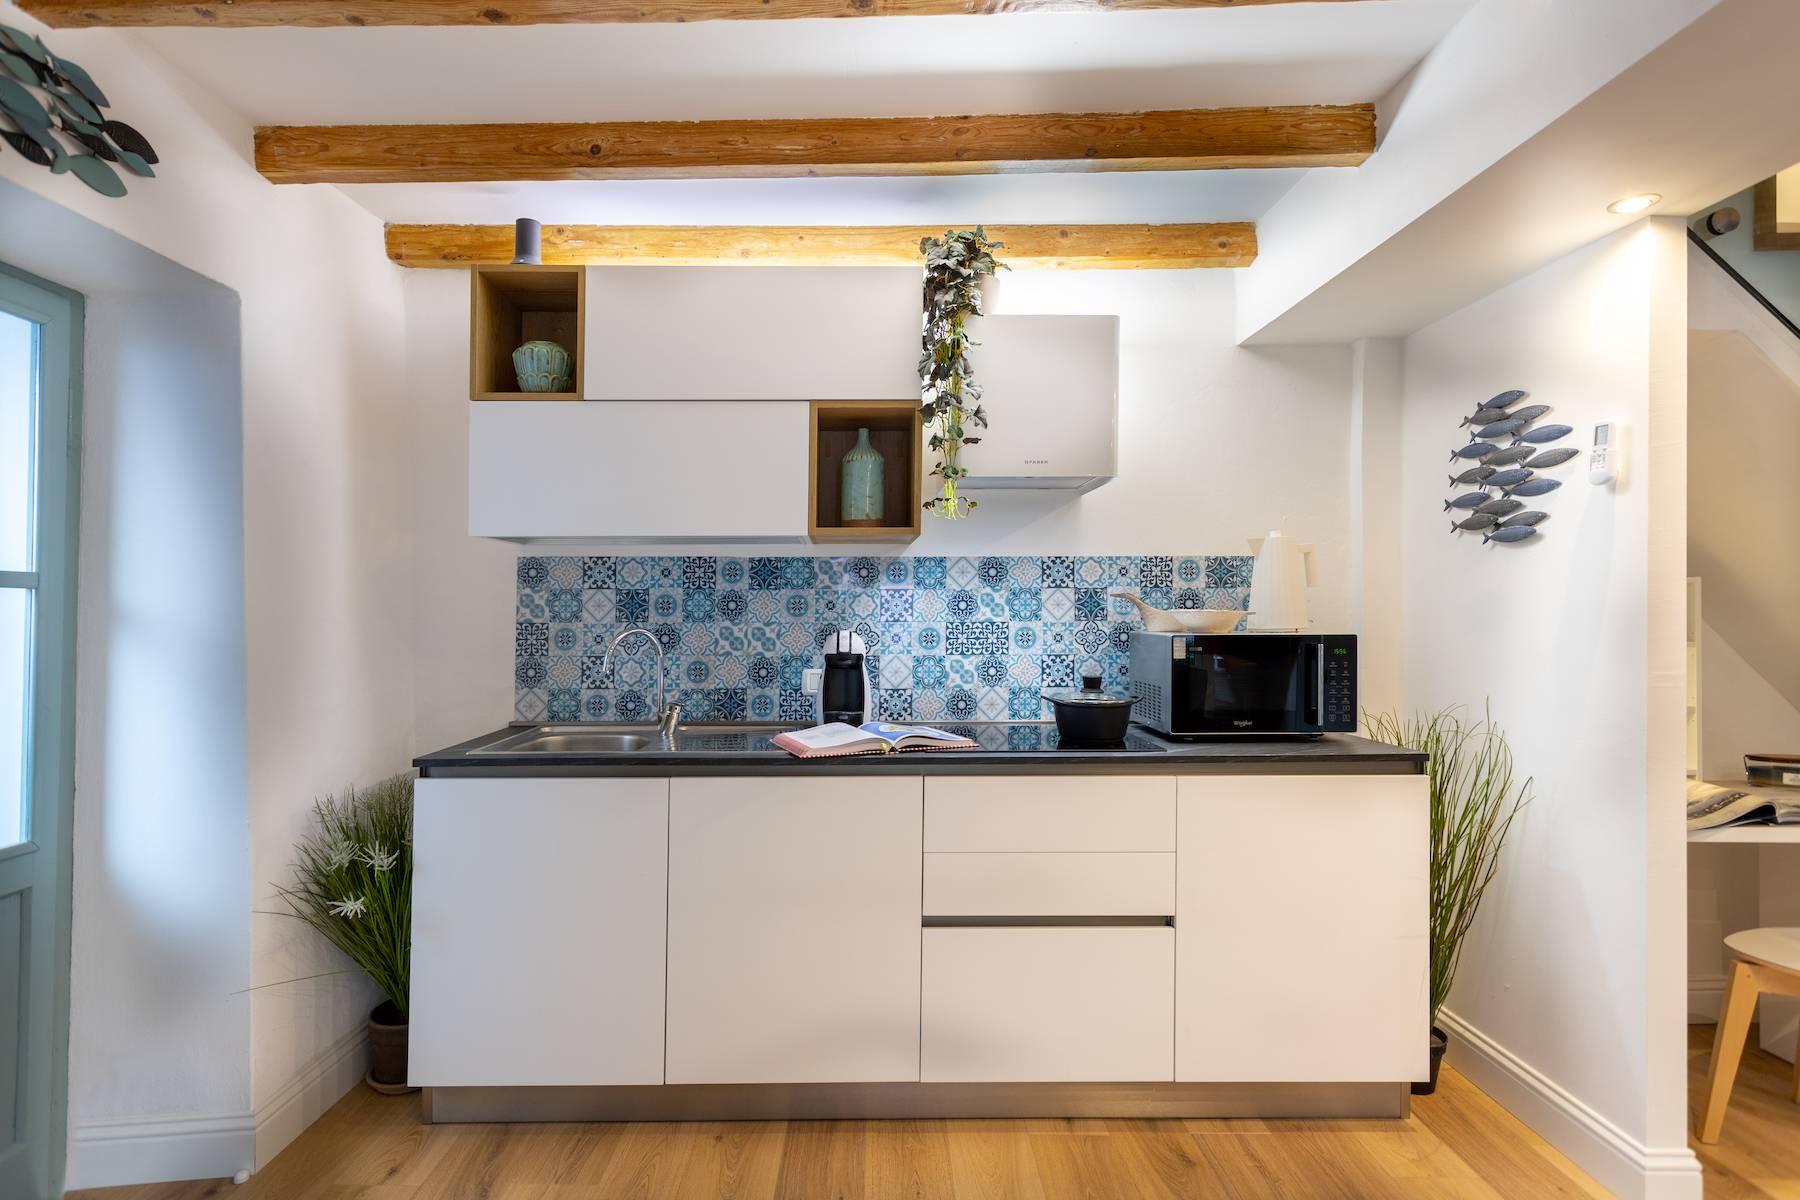 Appartamento in Vendita a Belgirate: 3 locali, 62 mq - Foto 12